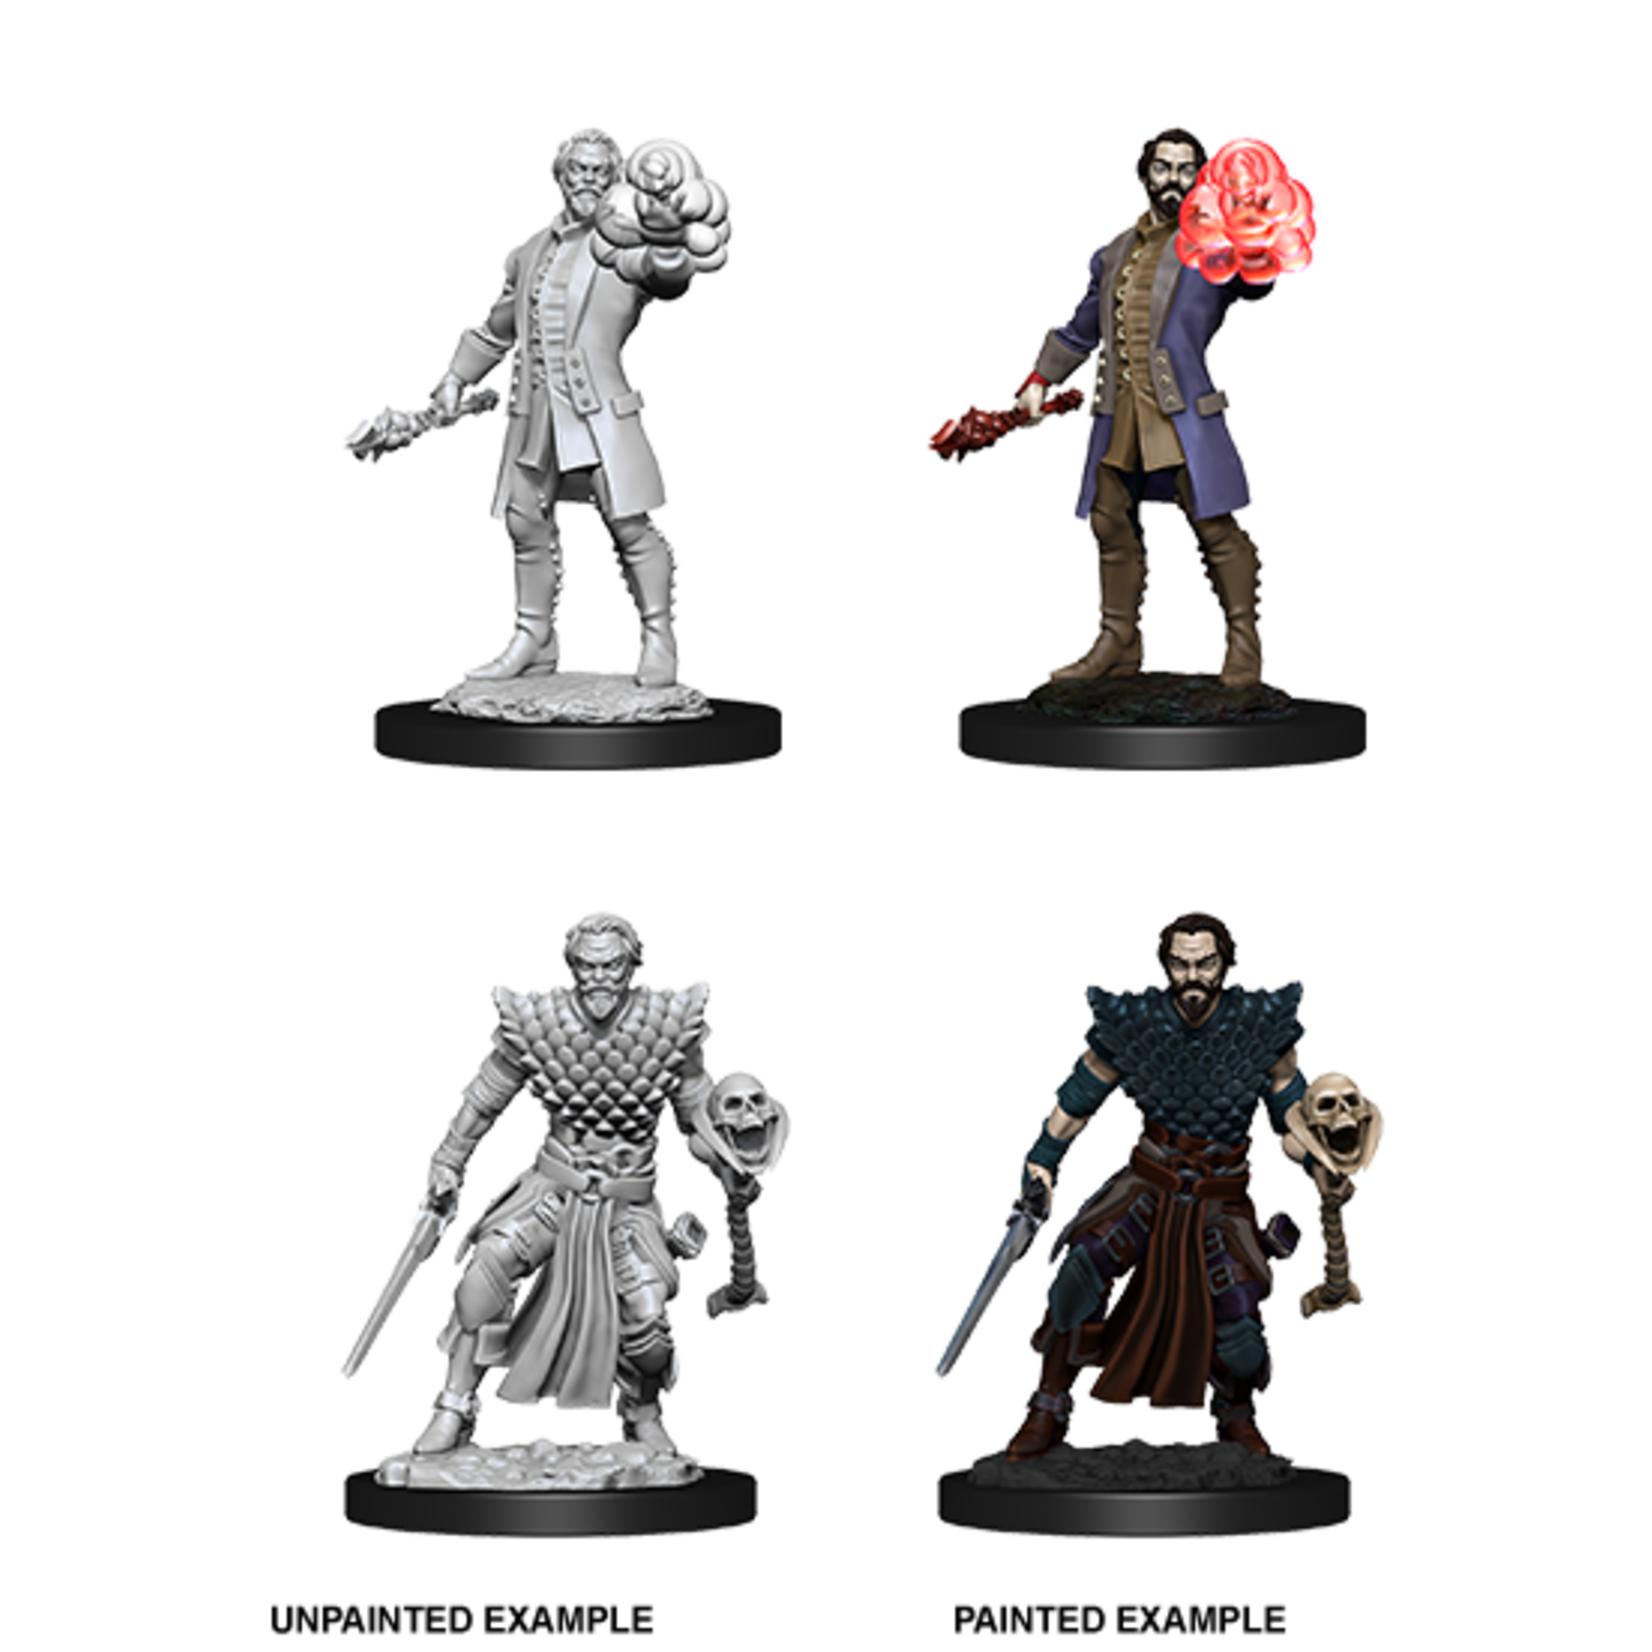 WizKids D&D Nolzur's Marvelous Miniatures: Male Human Warlock  (W10)